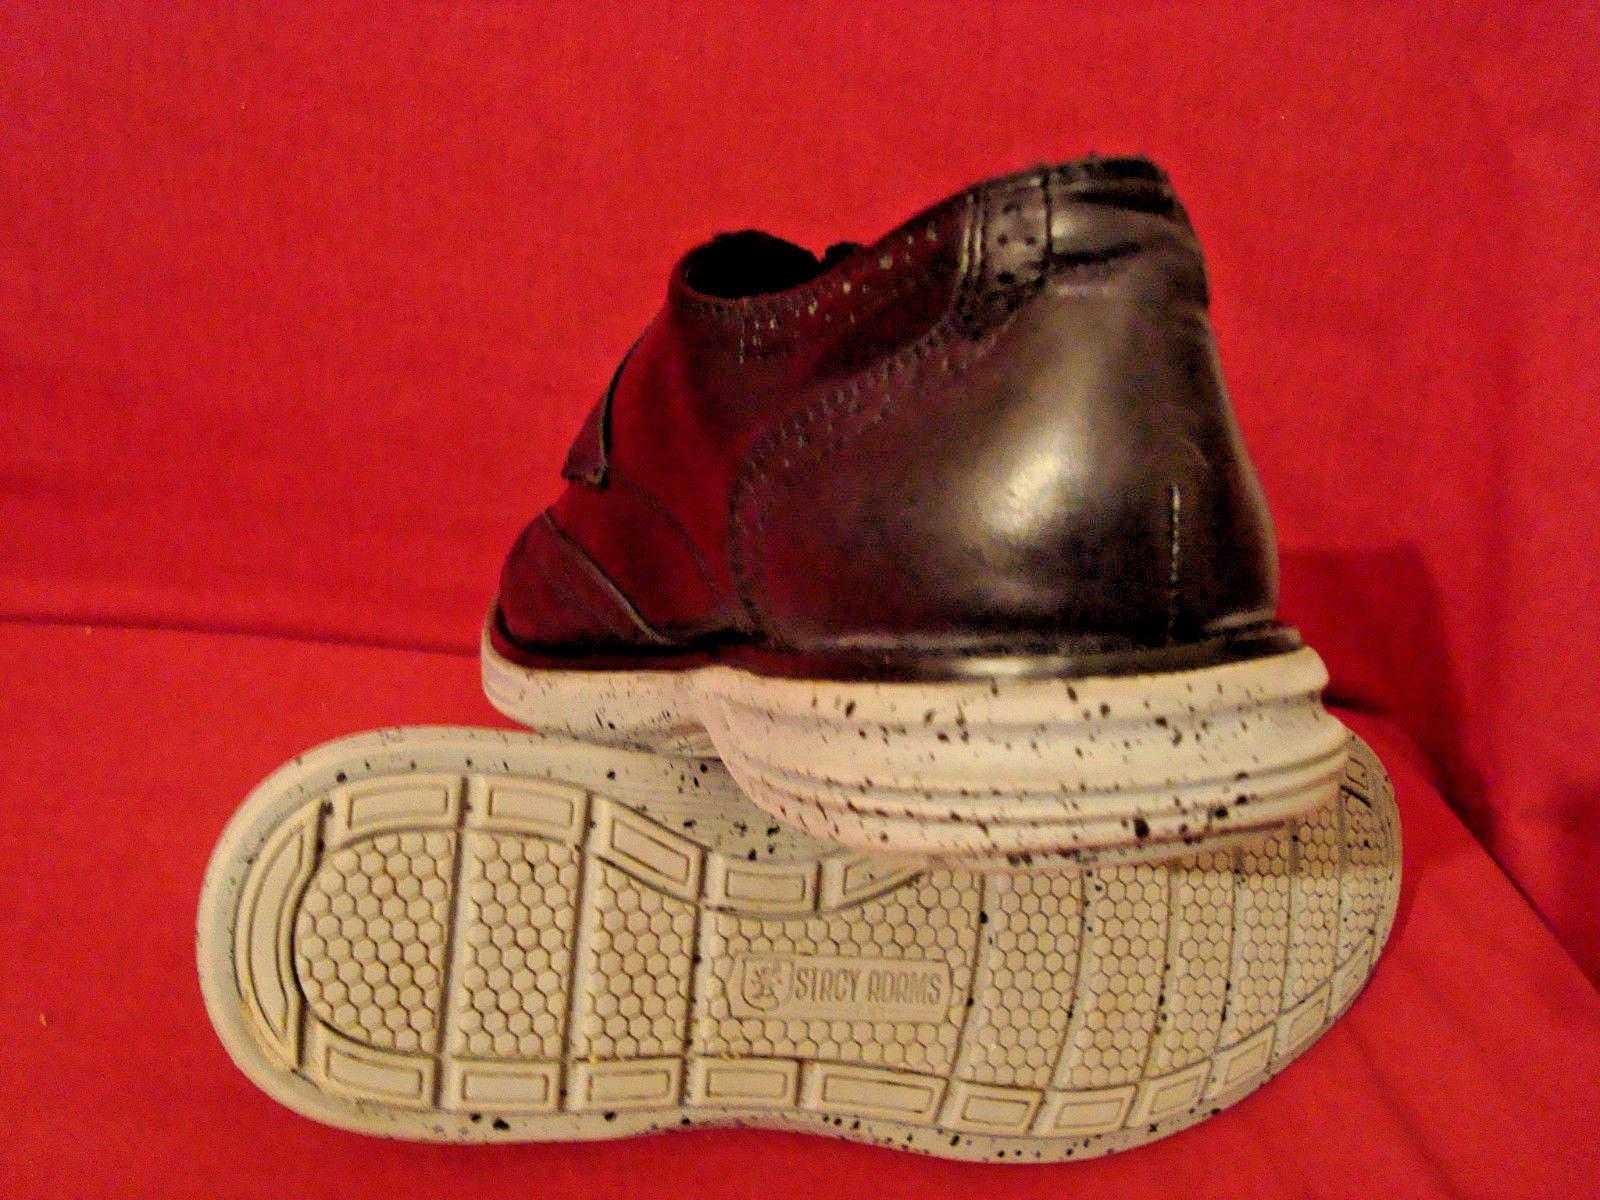 STACY BLACK ADAMS 1875  Herren BLACK STACY & GRAY DRESS CASUAL Schuhe SIZE 10.5 SLIGHTLY WORN d2c303